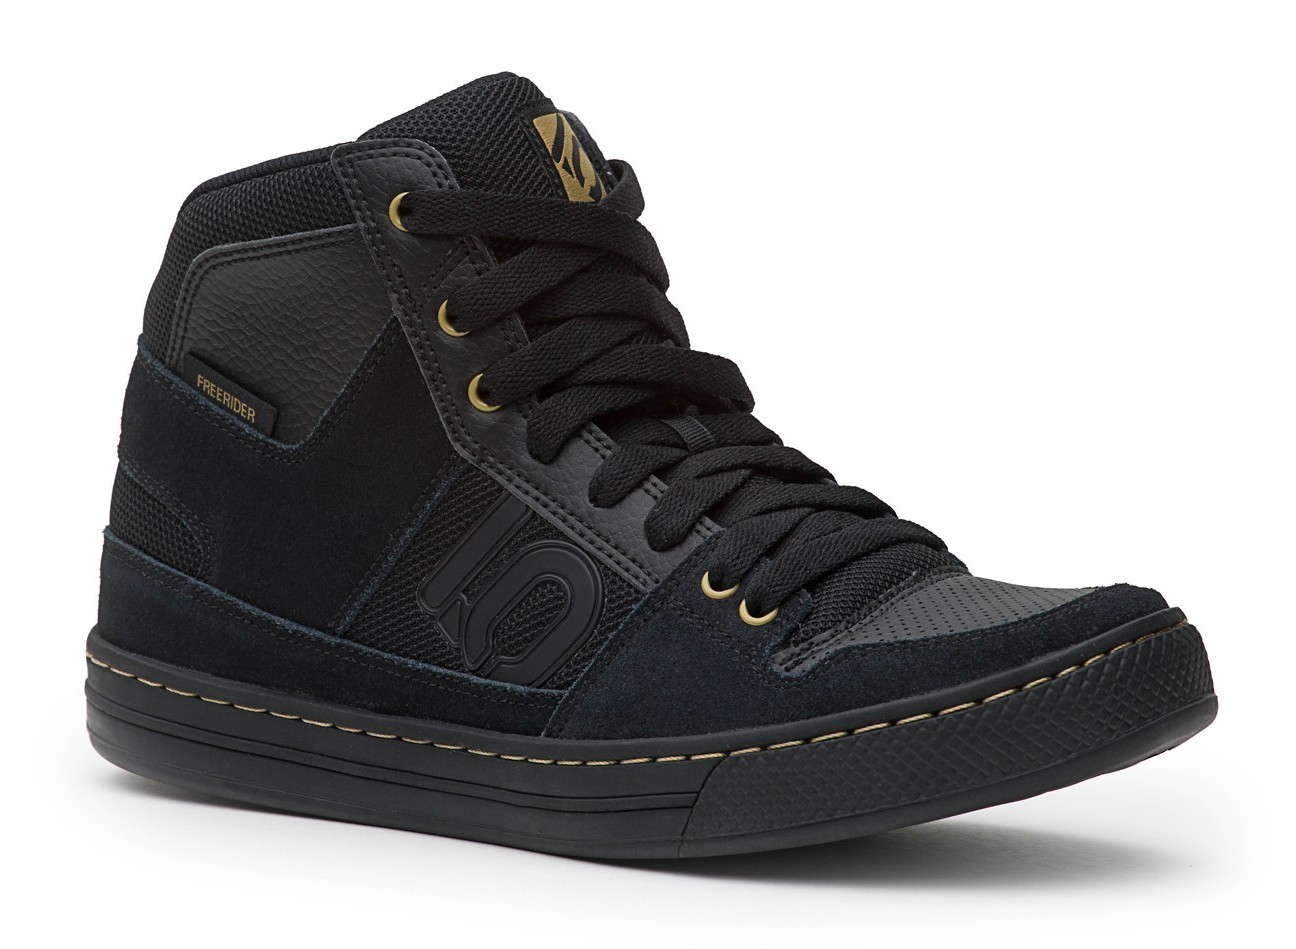 Five Ten Freerider High Flat Pedal Shoe